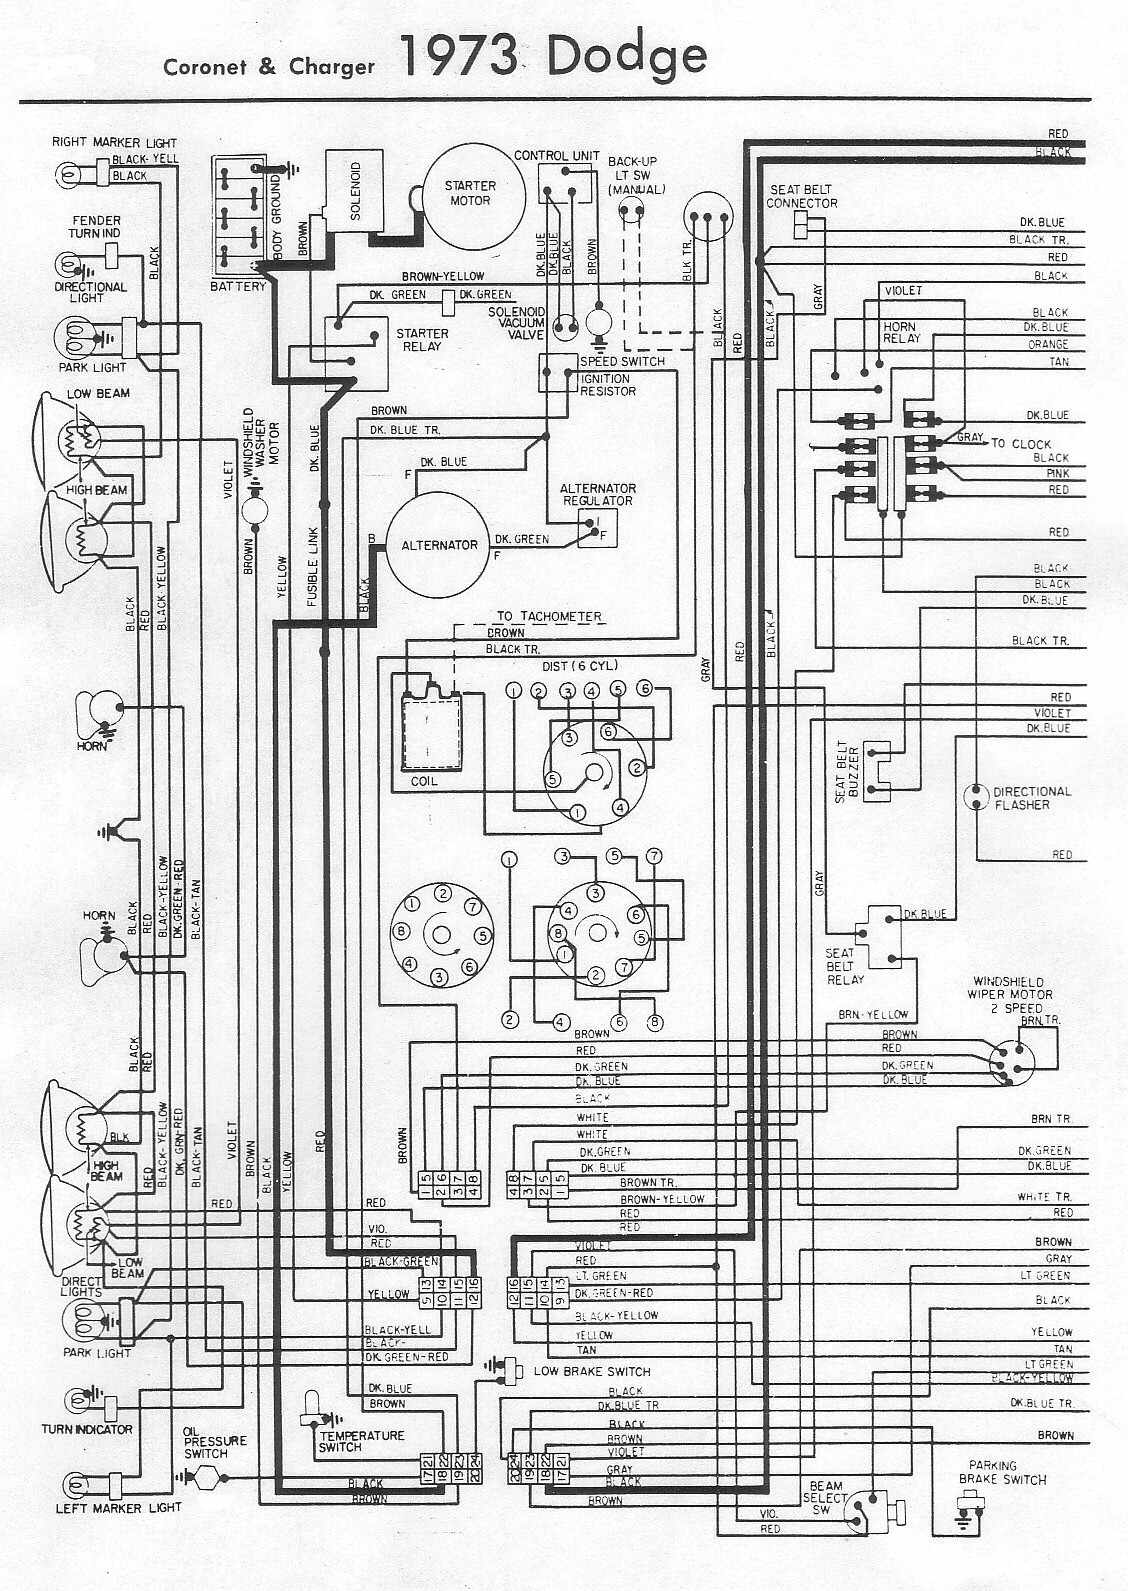 Unusual Gem Car Battery Wiring Diagram Photos - Electrical Circuit ...